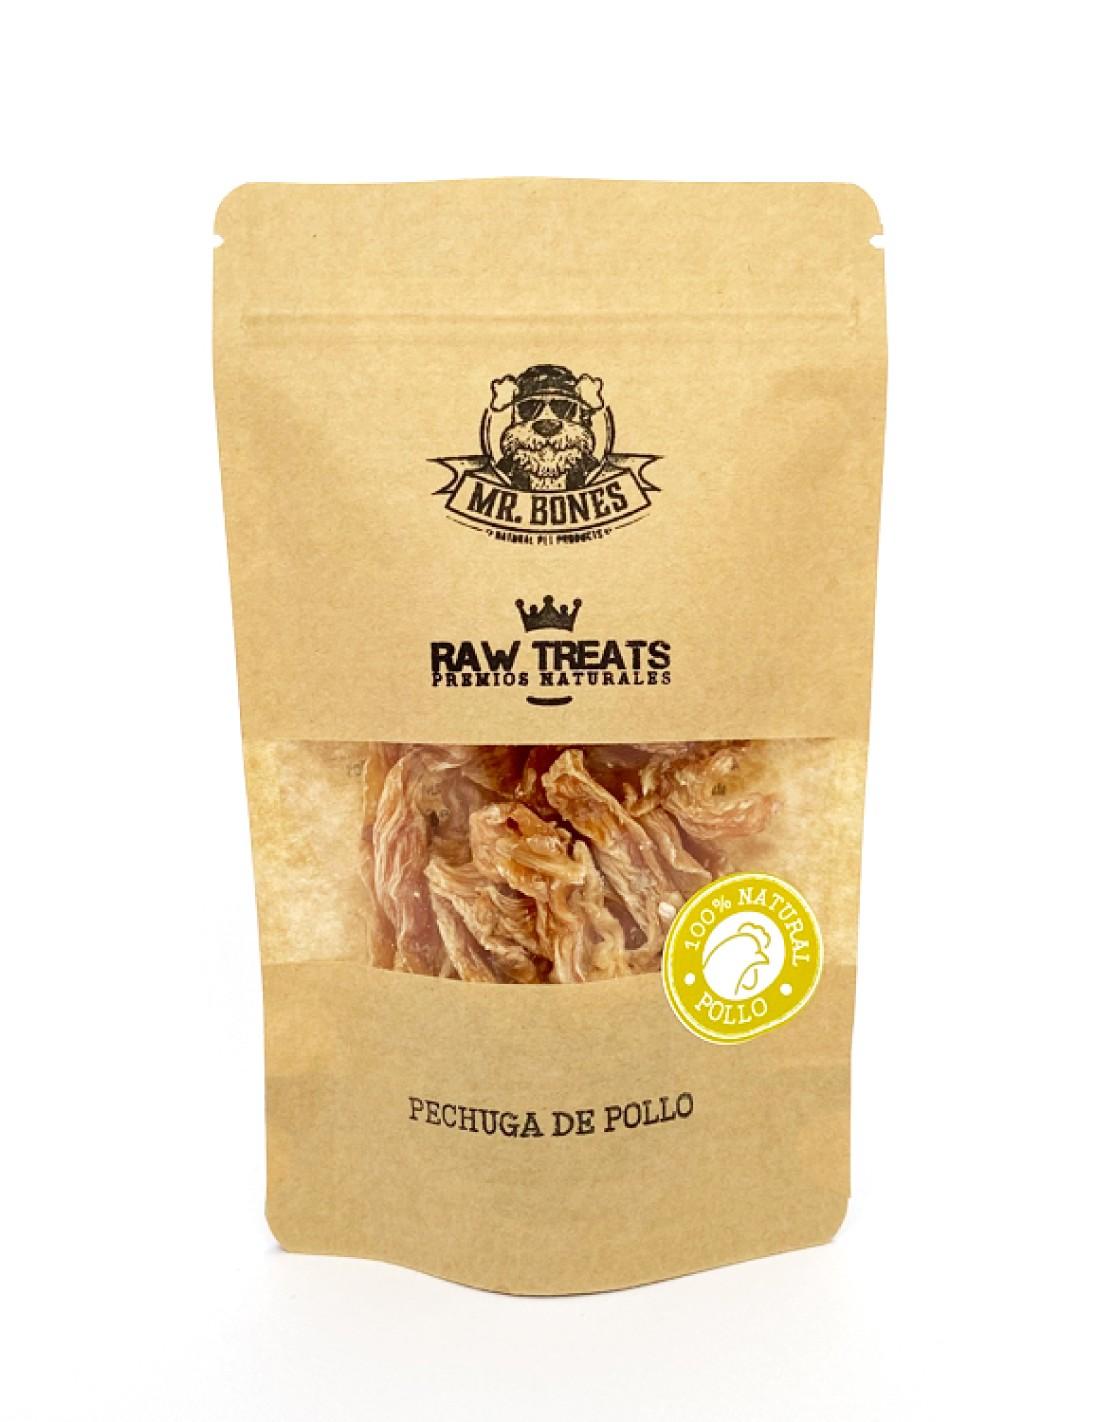 Pechuga de Pollo (45g) - Premios Naturales Deshidratados